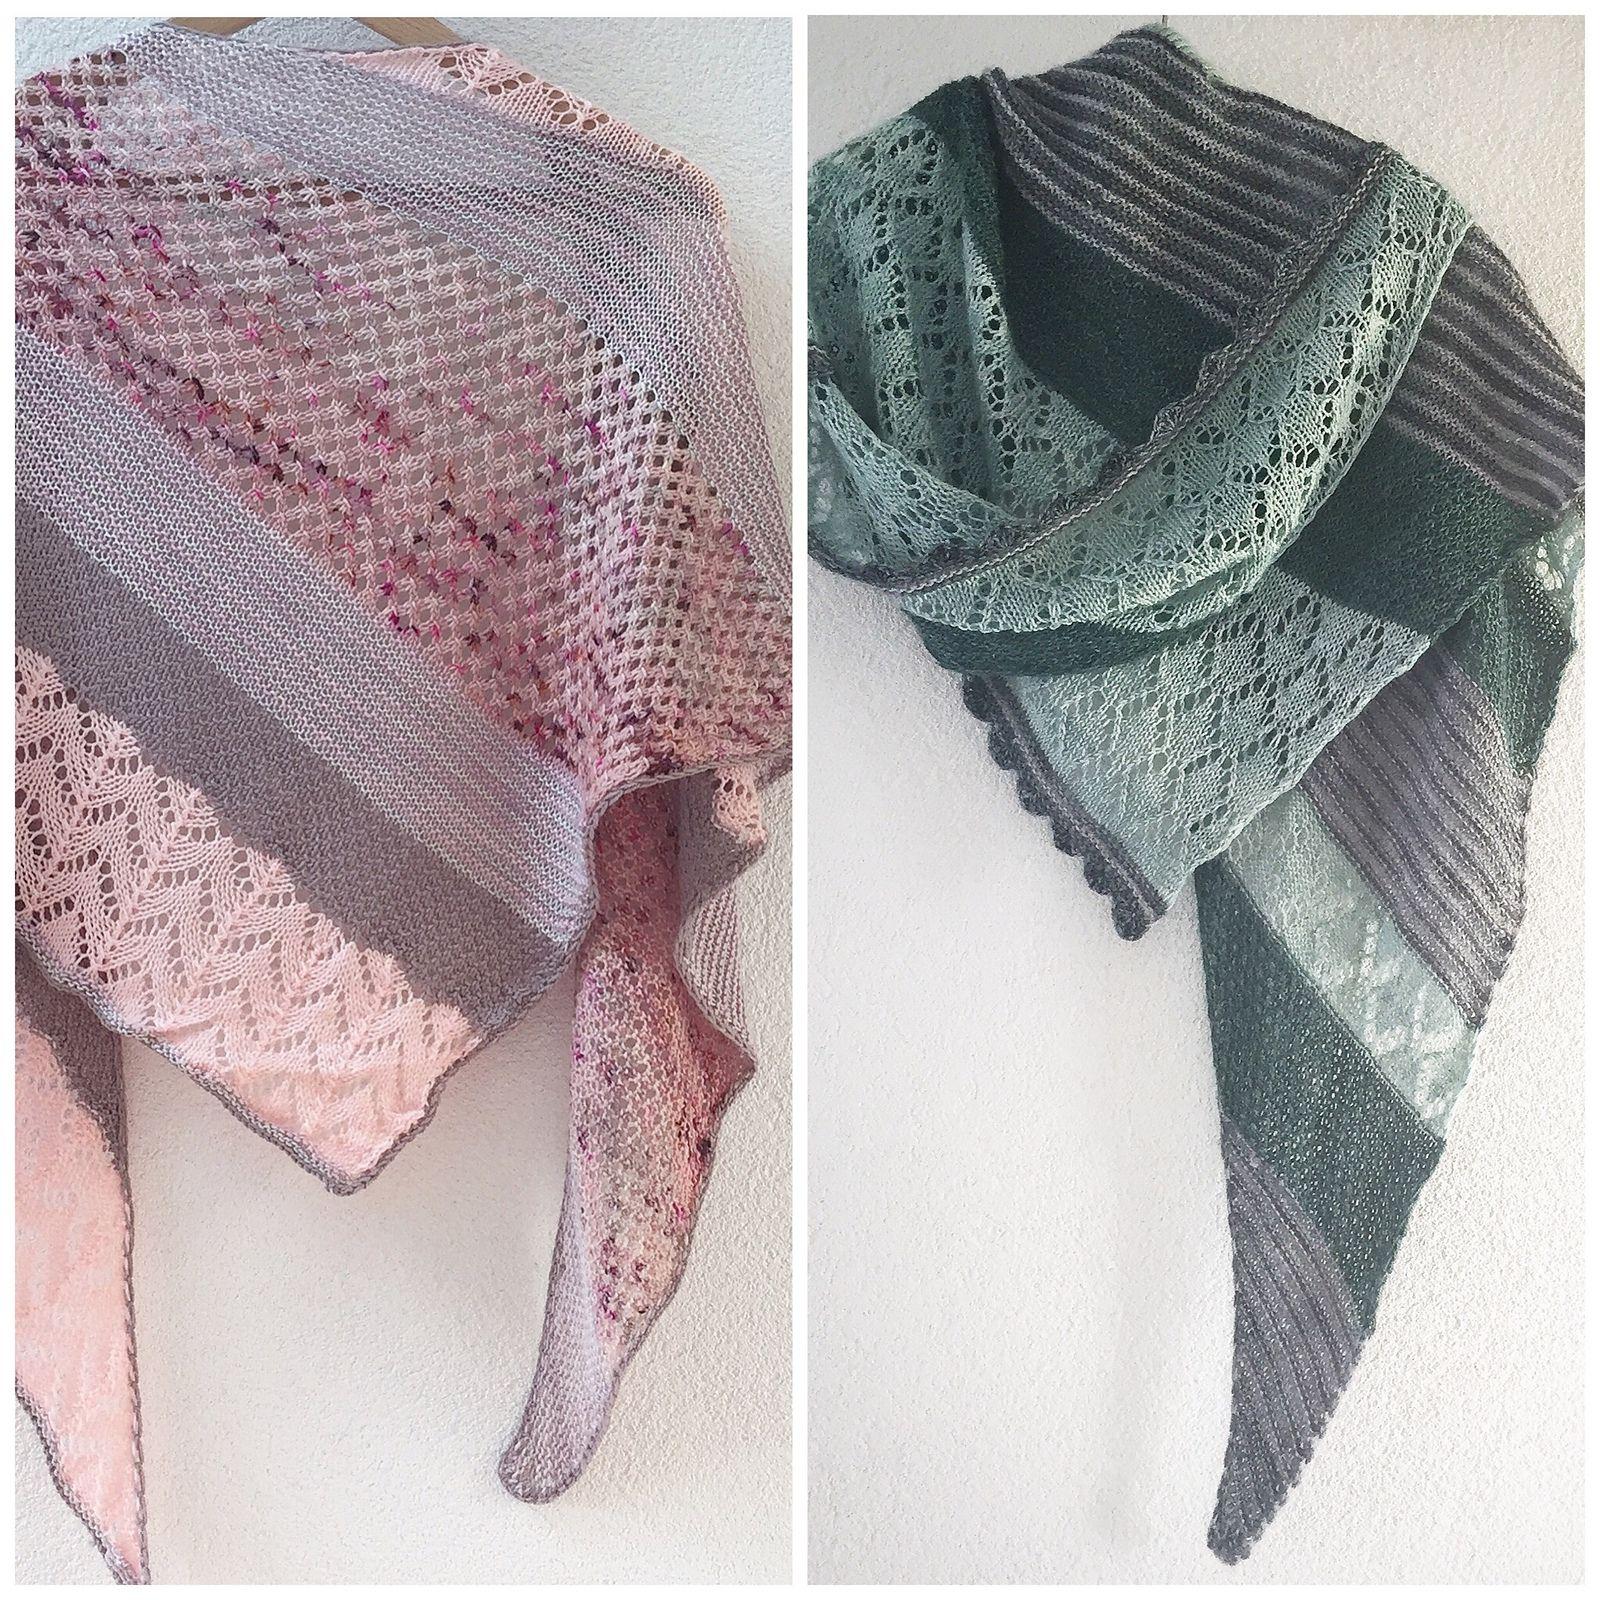 Ravelry: Don\'t stop me now shawl by Rachel Schenk | yarn | Pinterest ...